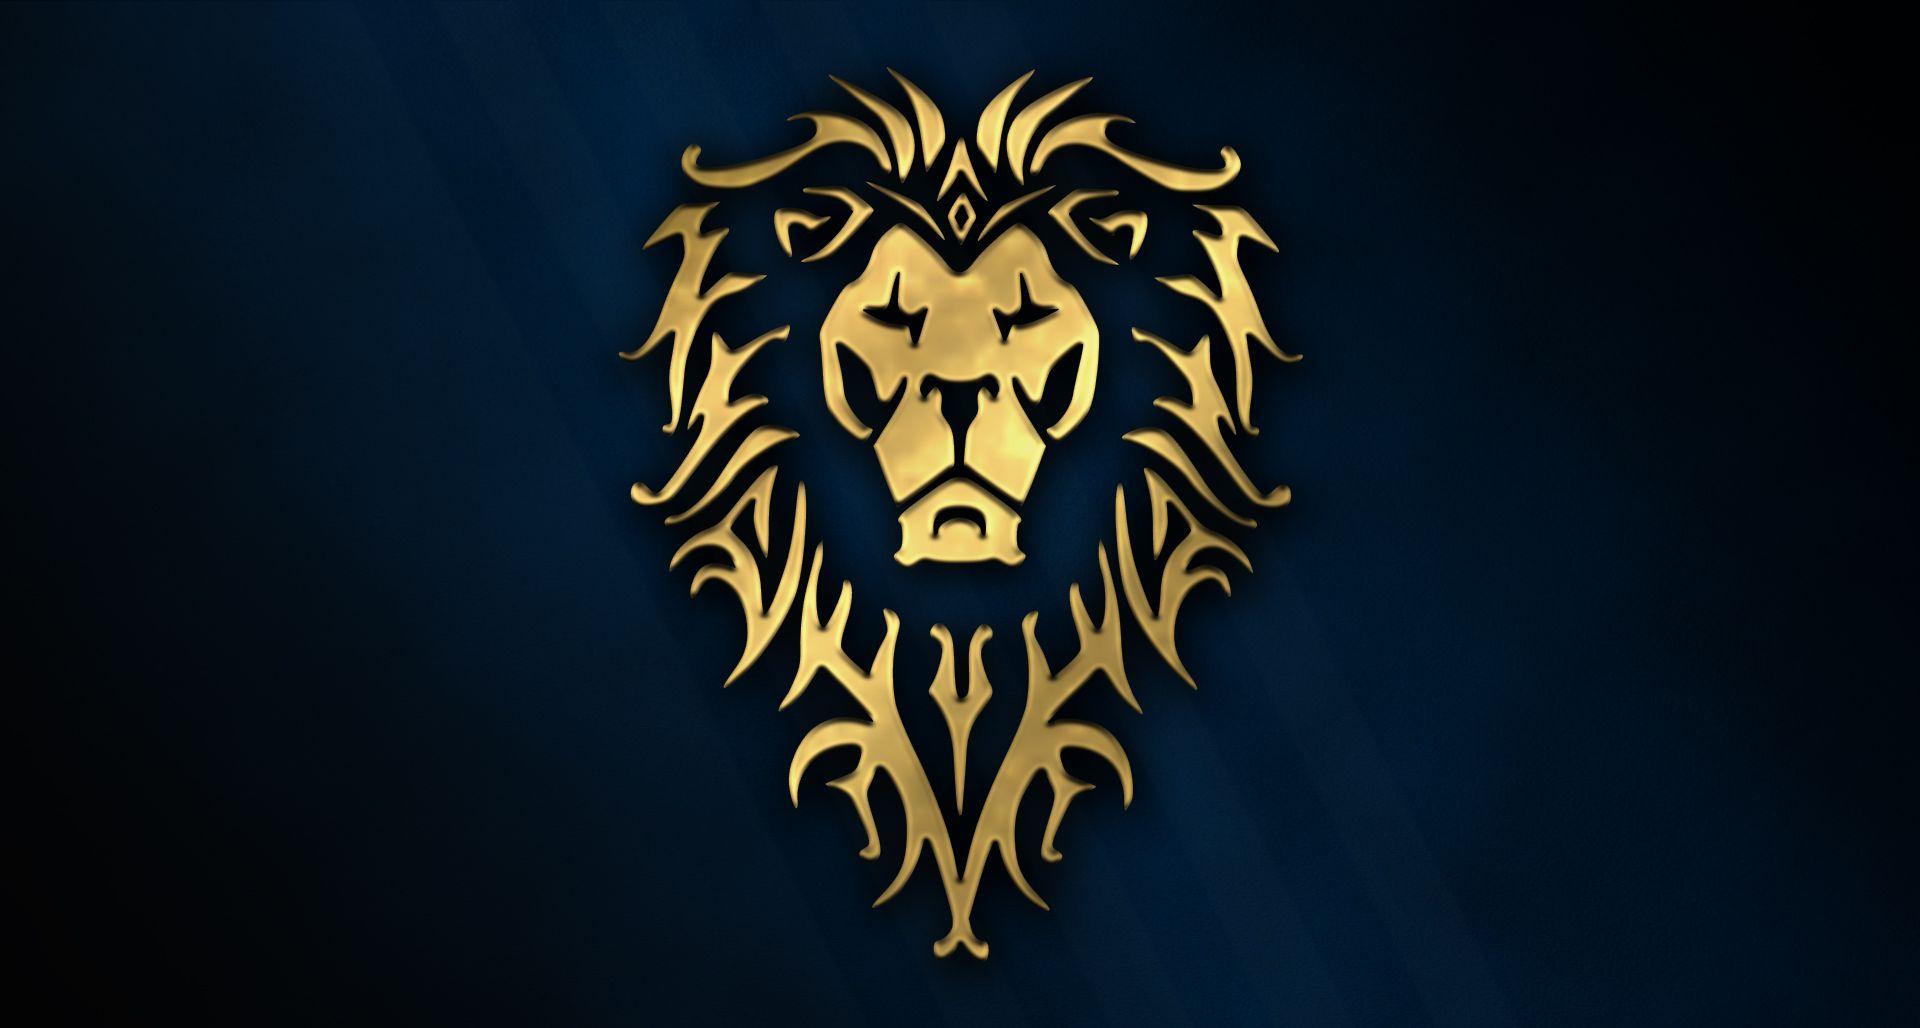 Worldofwarcraftwallpaper Explore Worldofwarcraftwallpaper On Warcraft Art Lion Logo Warcraft Movie